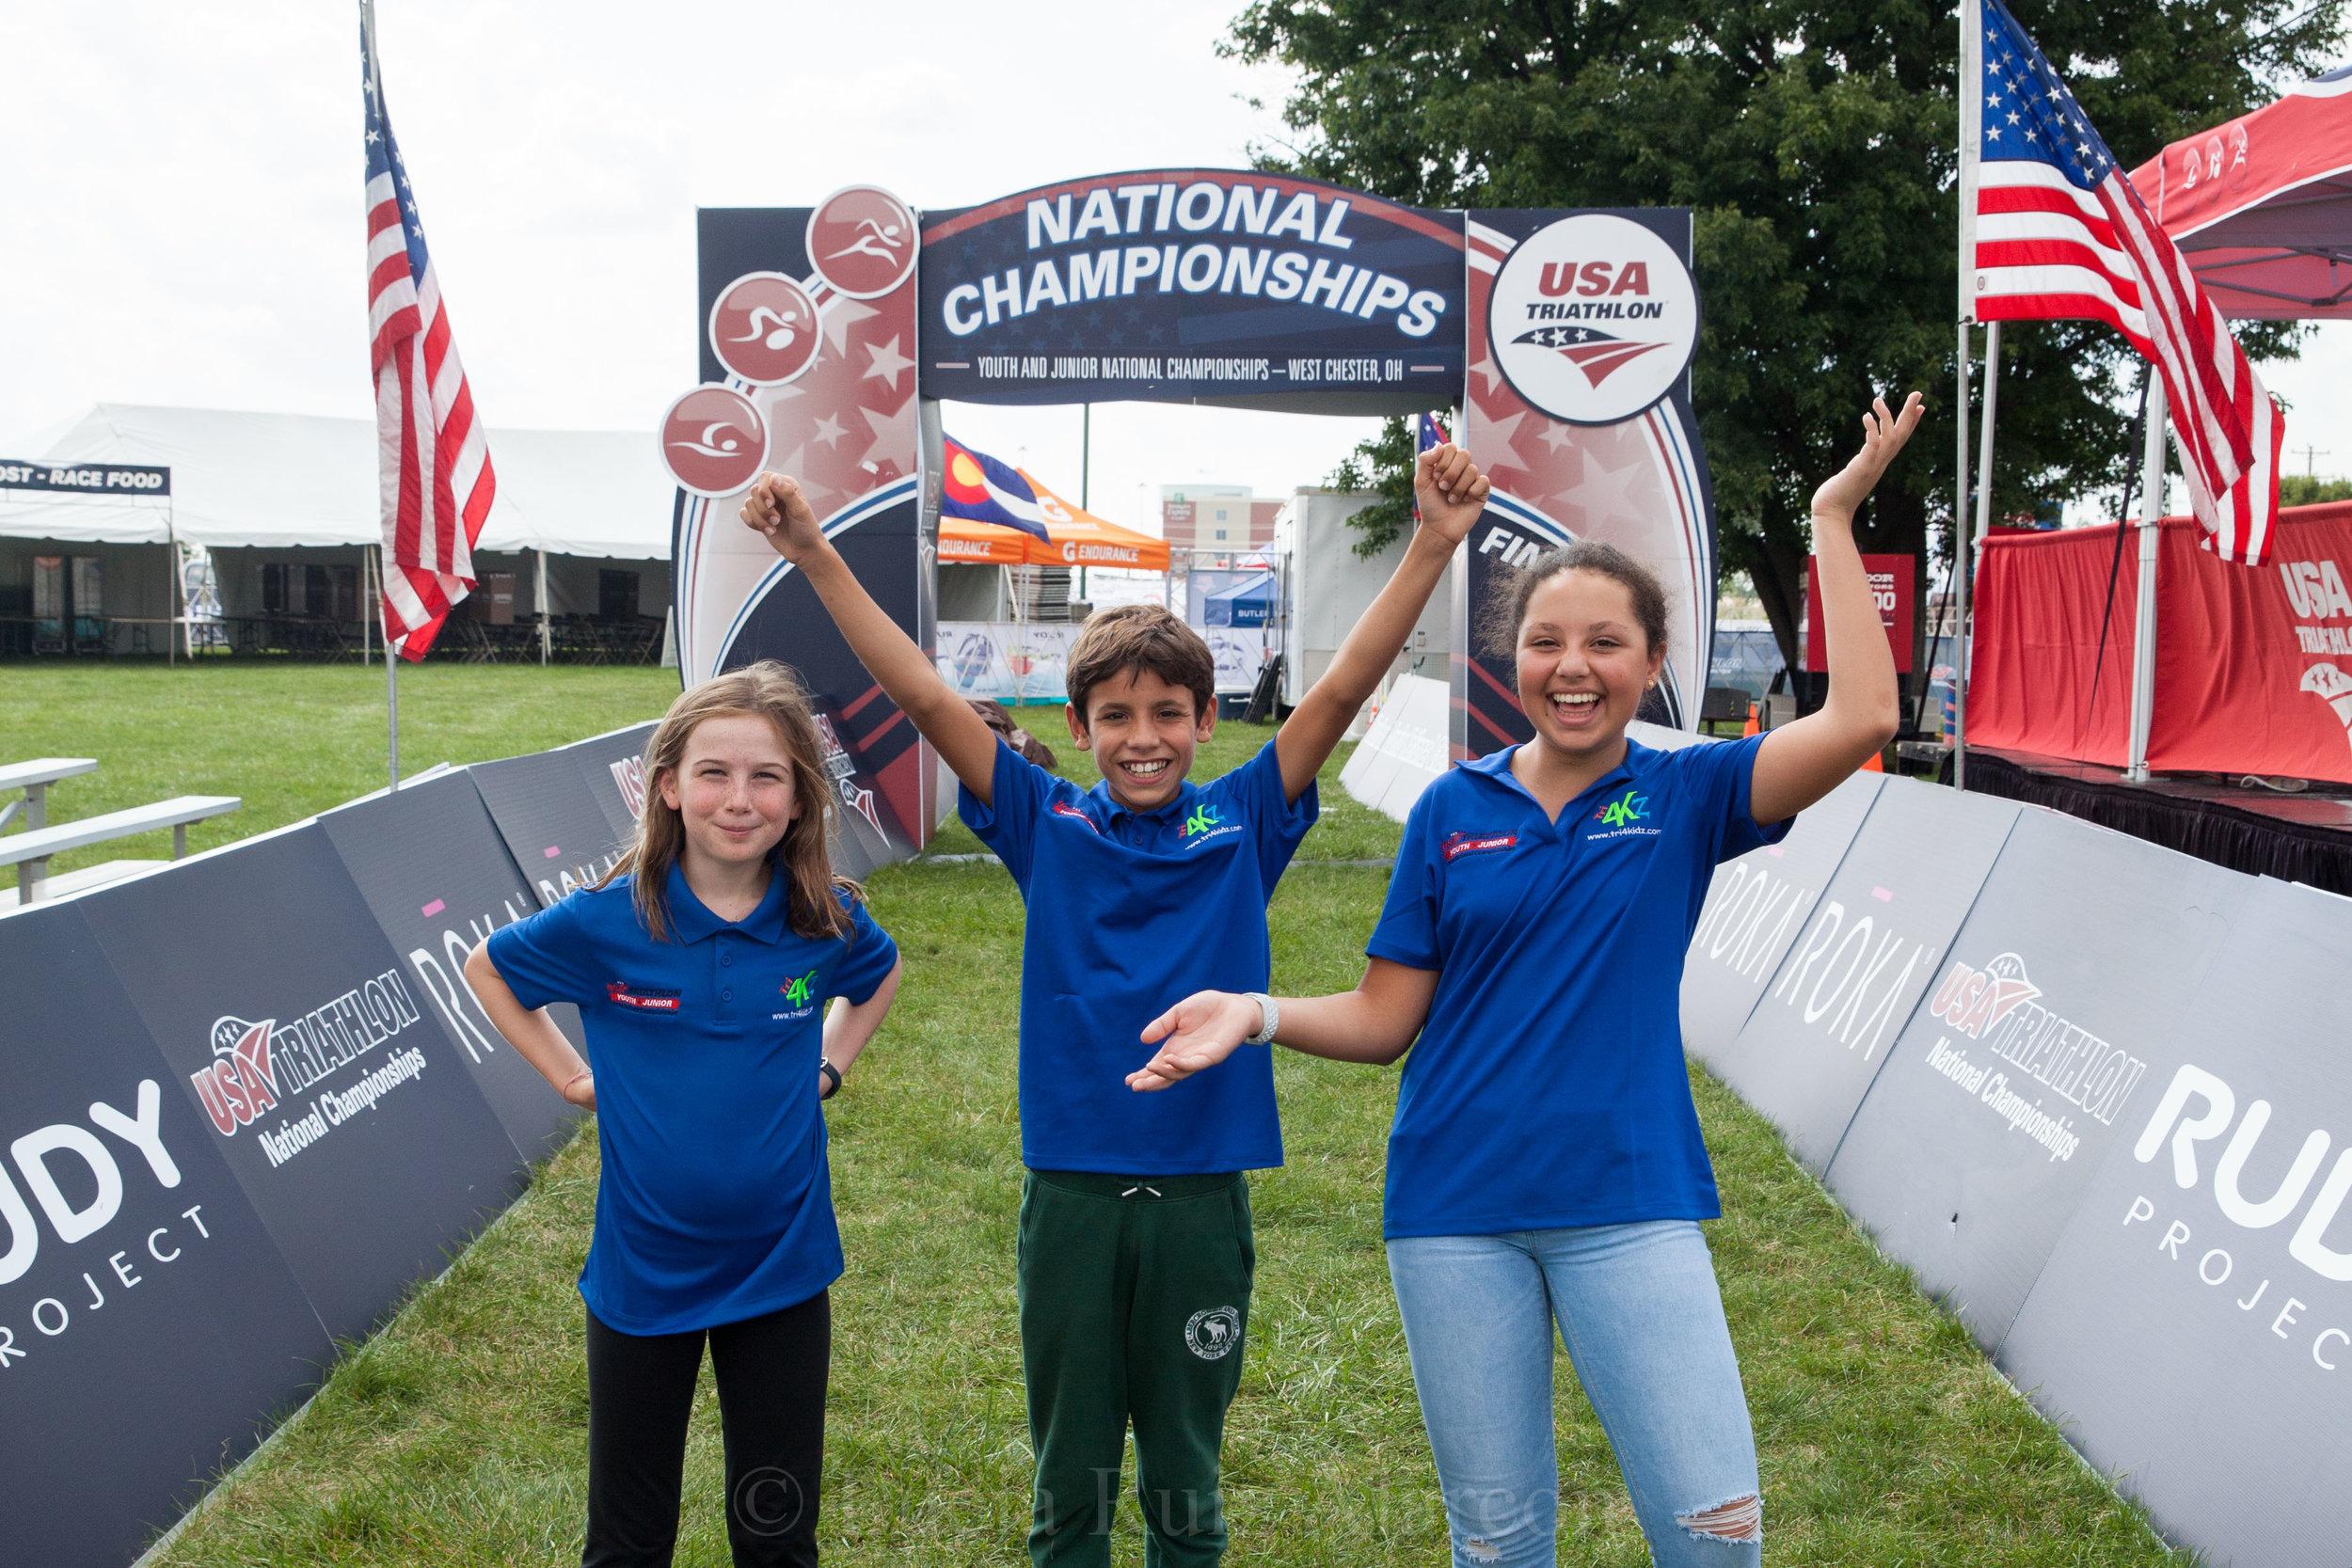 National Championships Triathlon 2018-8.jpg